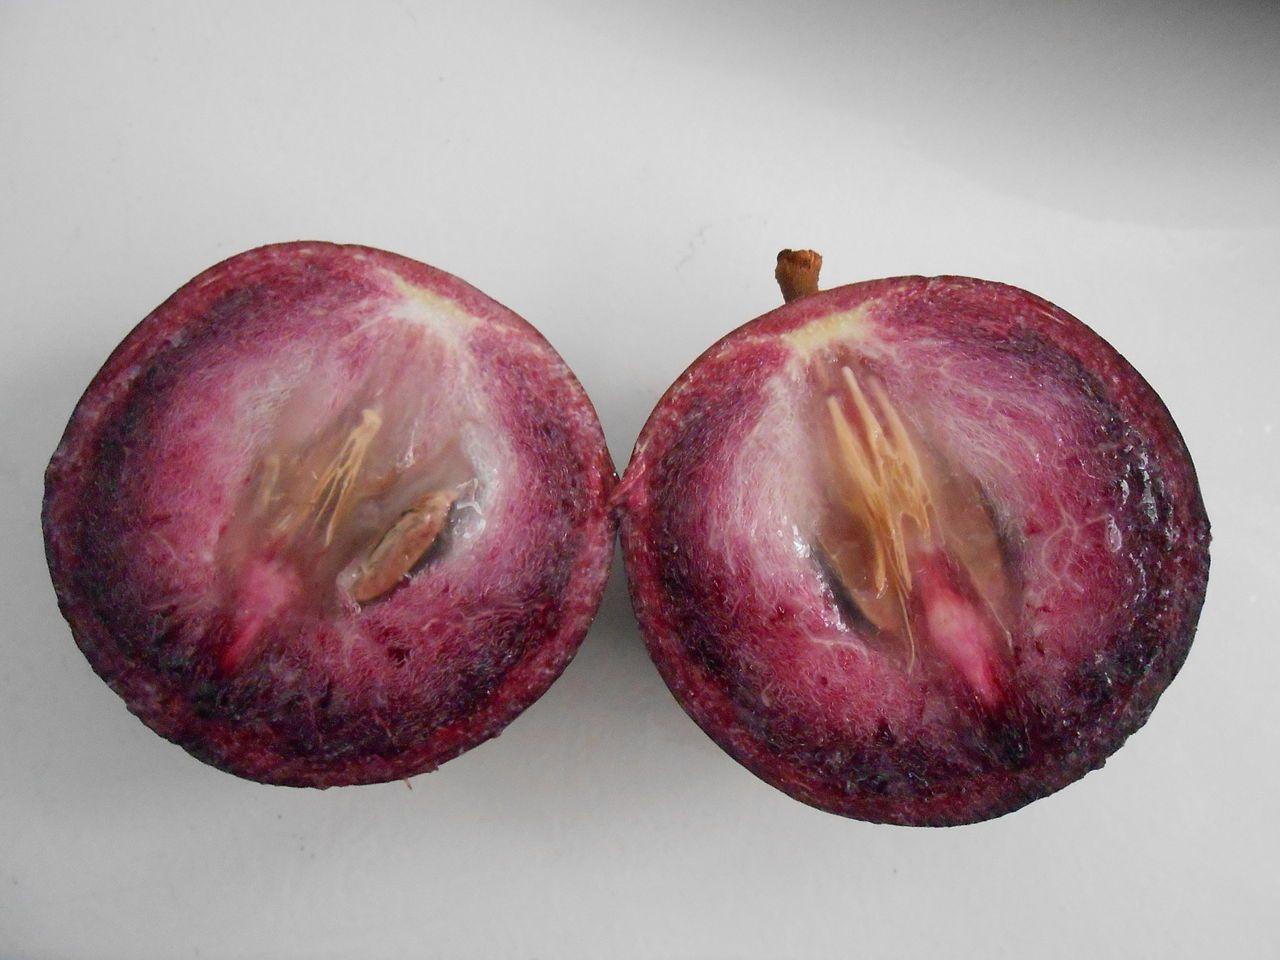 Chrysophyllum Cainito / Kenitu / Sawo Duren / Star Apple